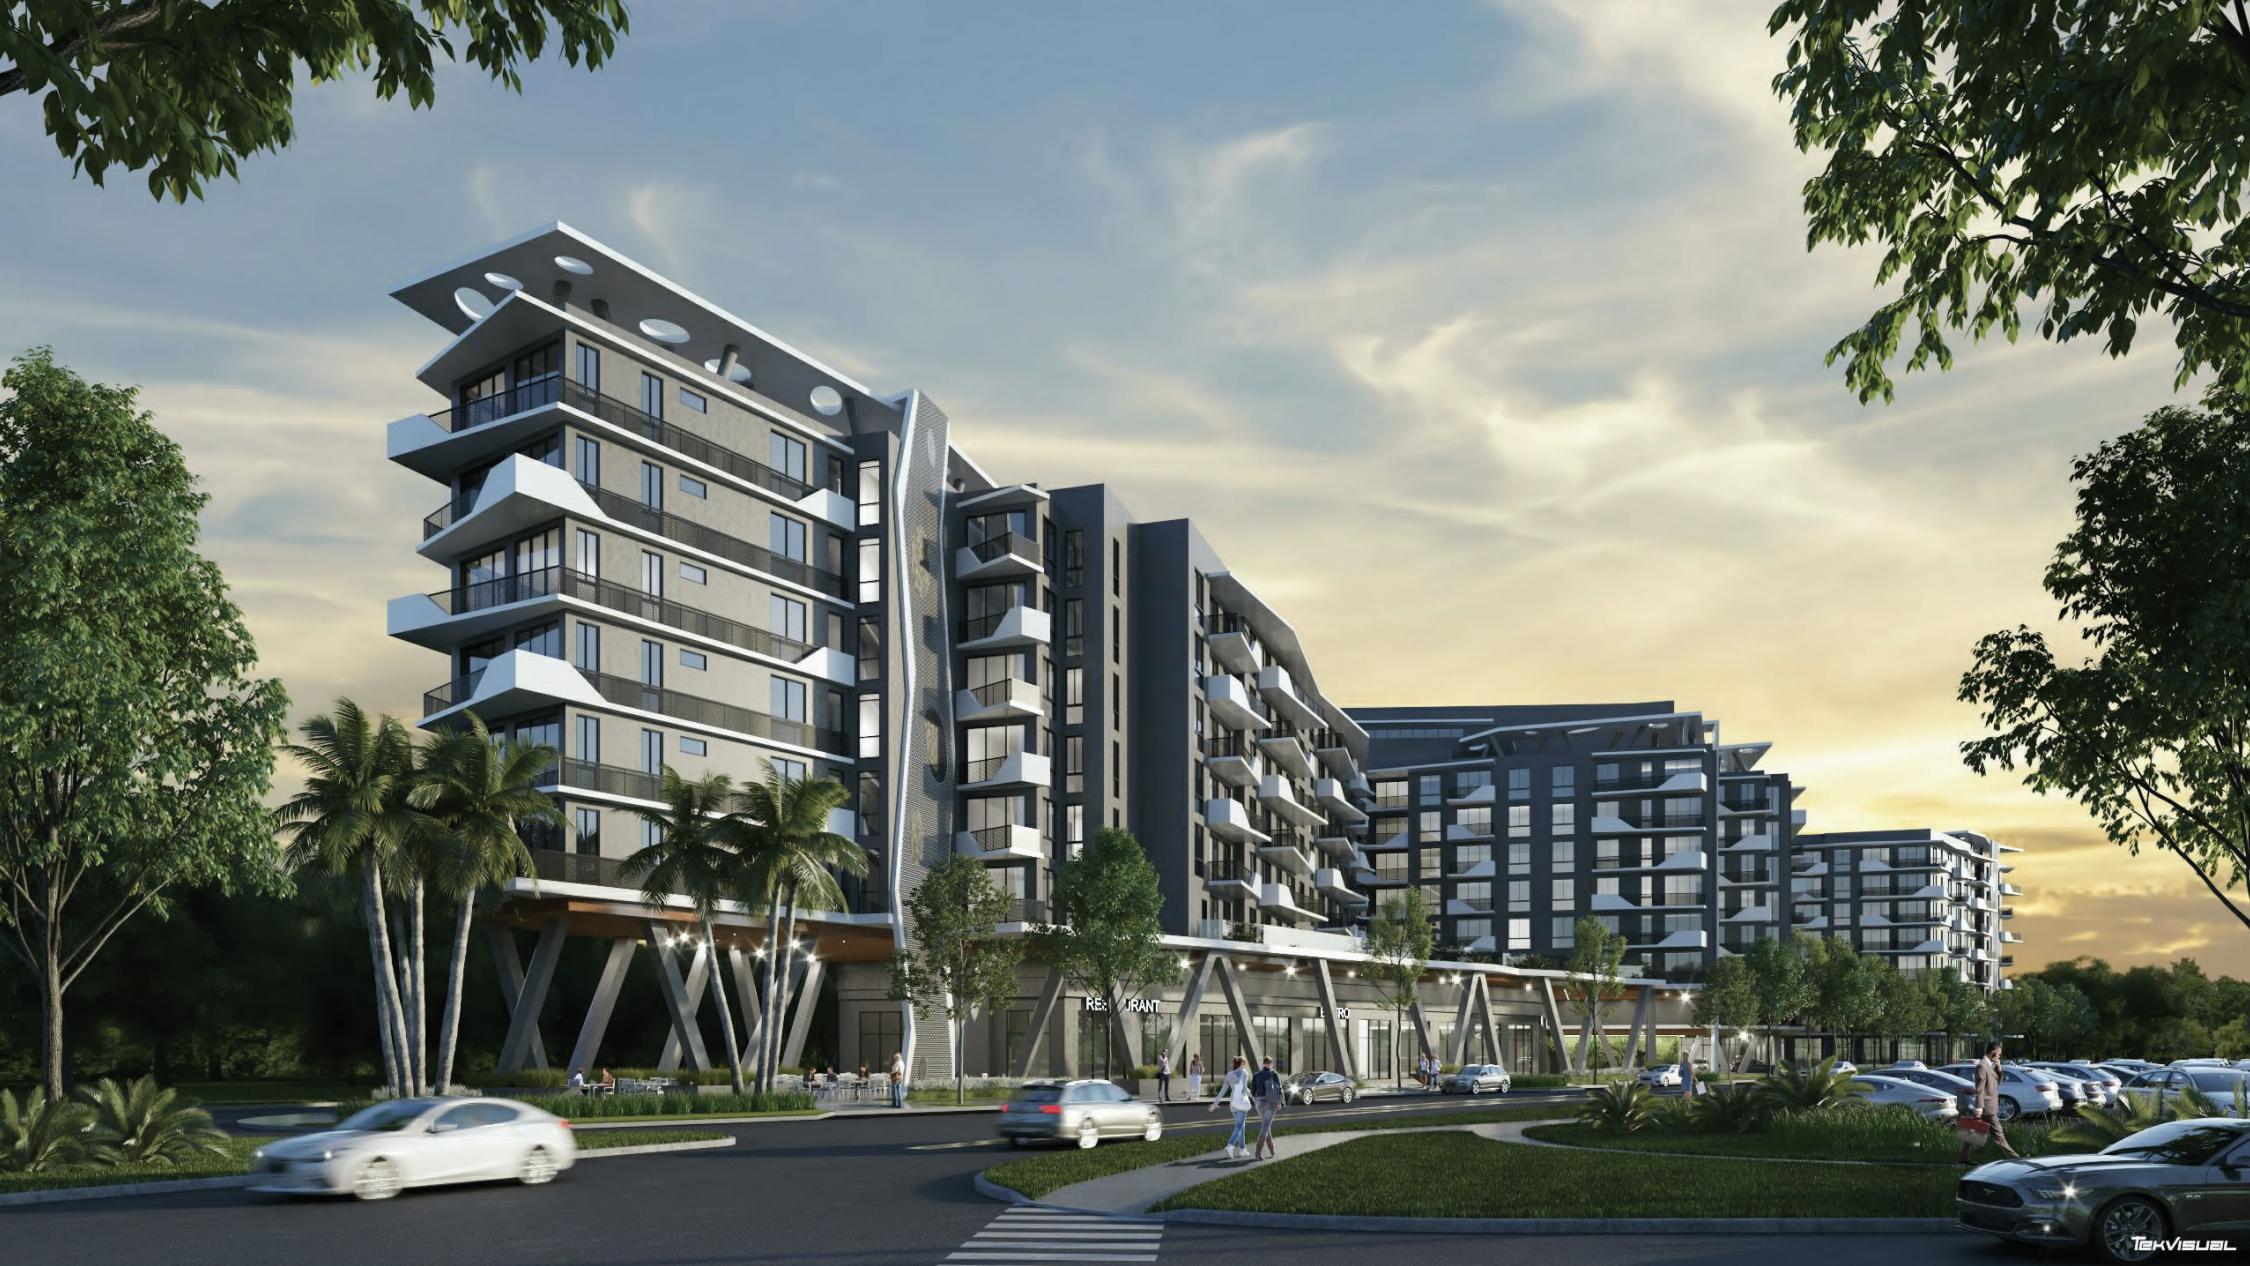 Aura North Miami Beach. Designed by Corwil Architects.